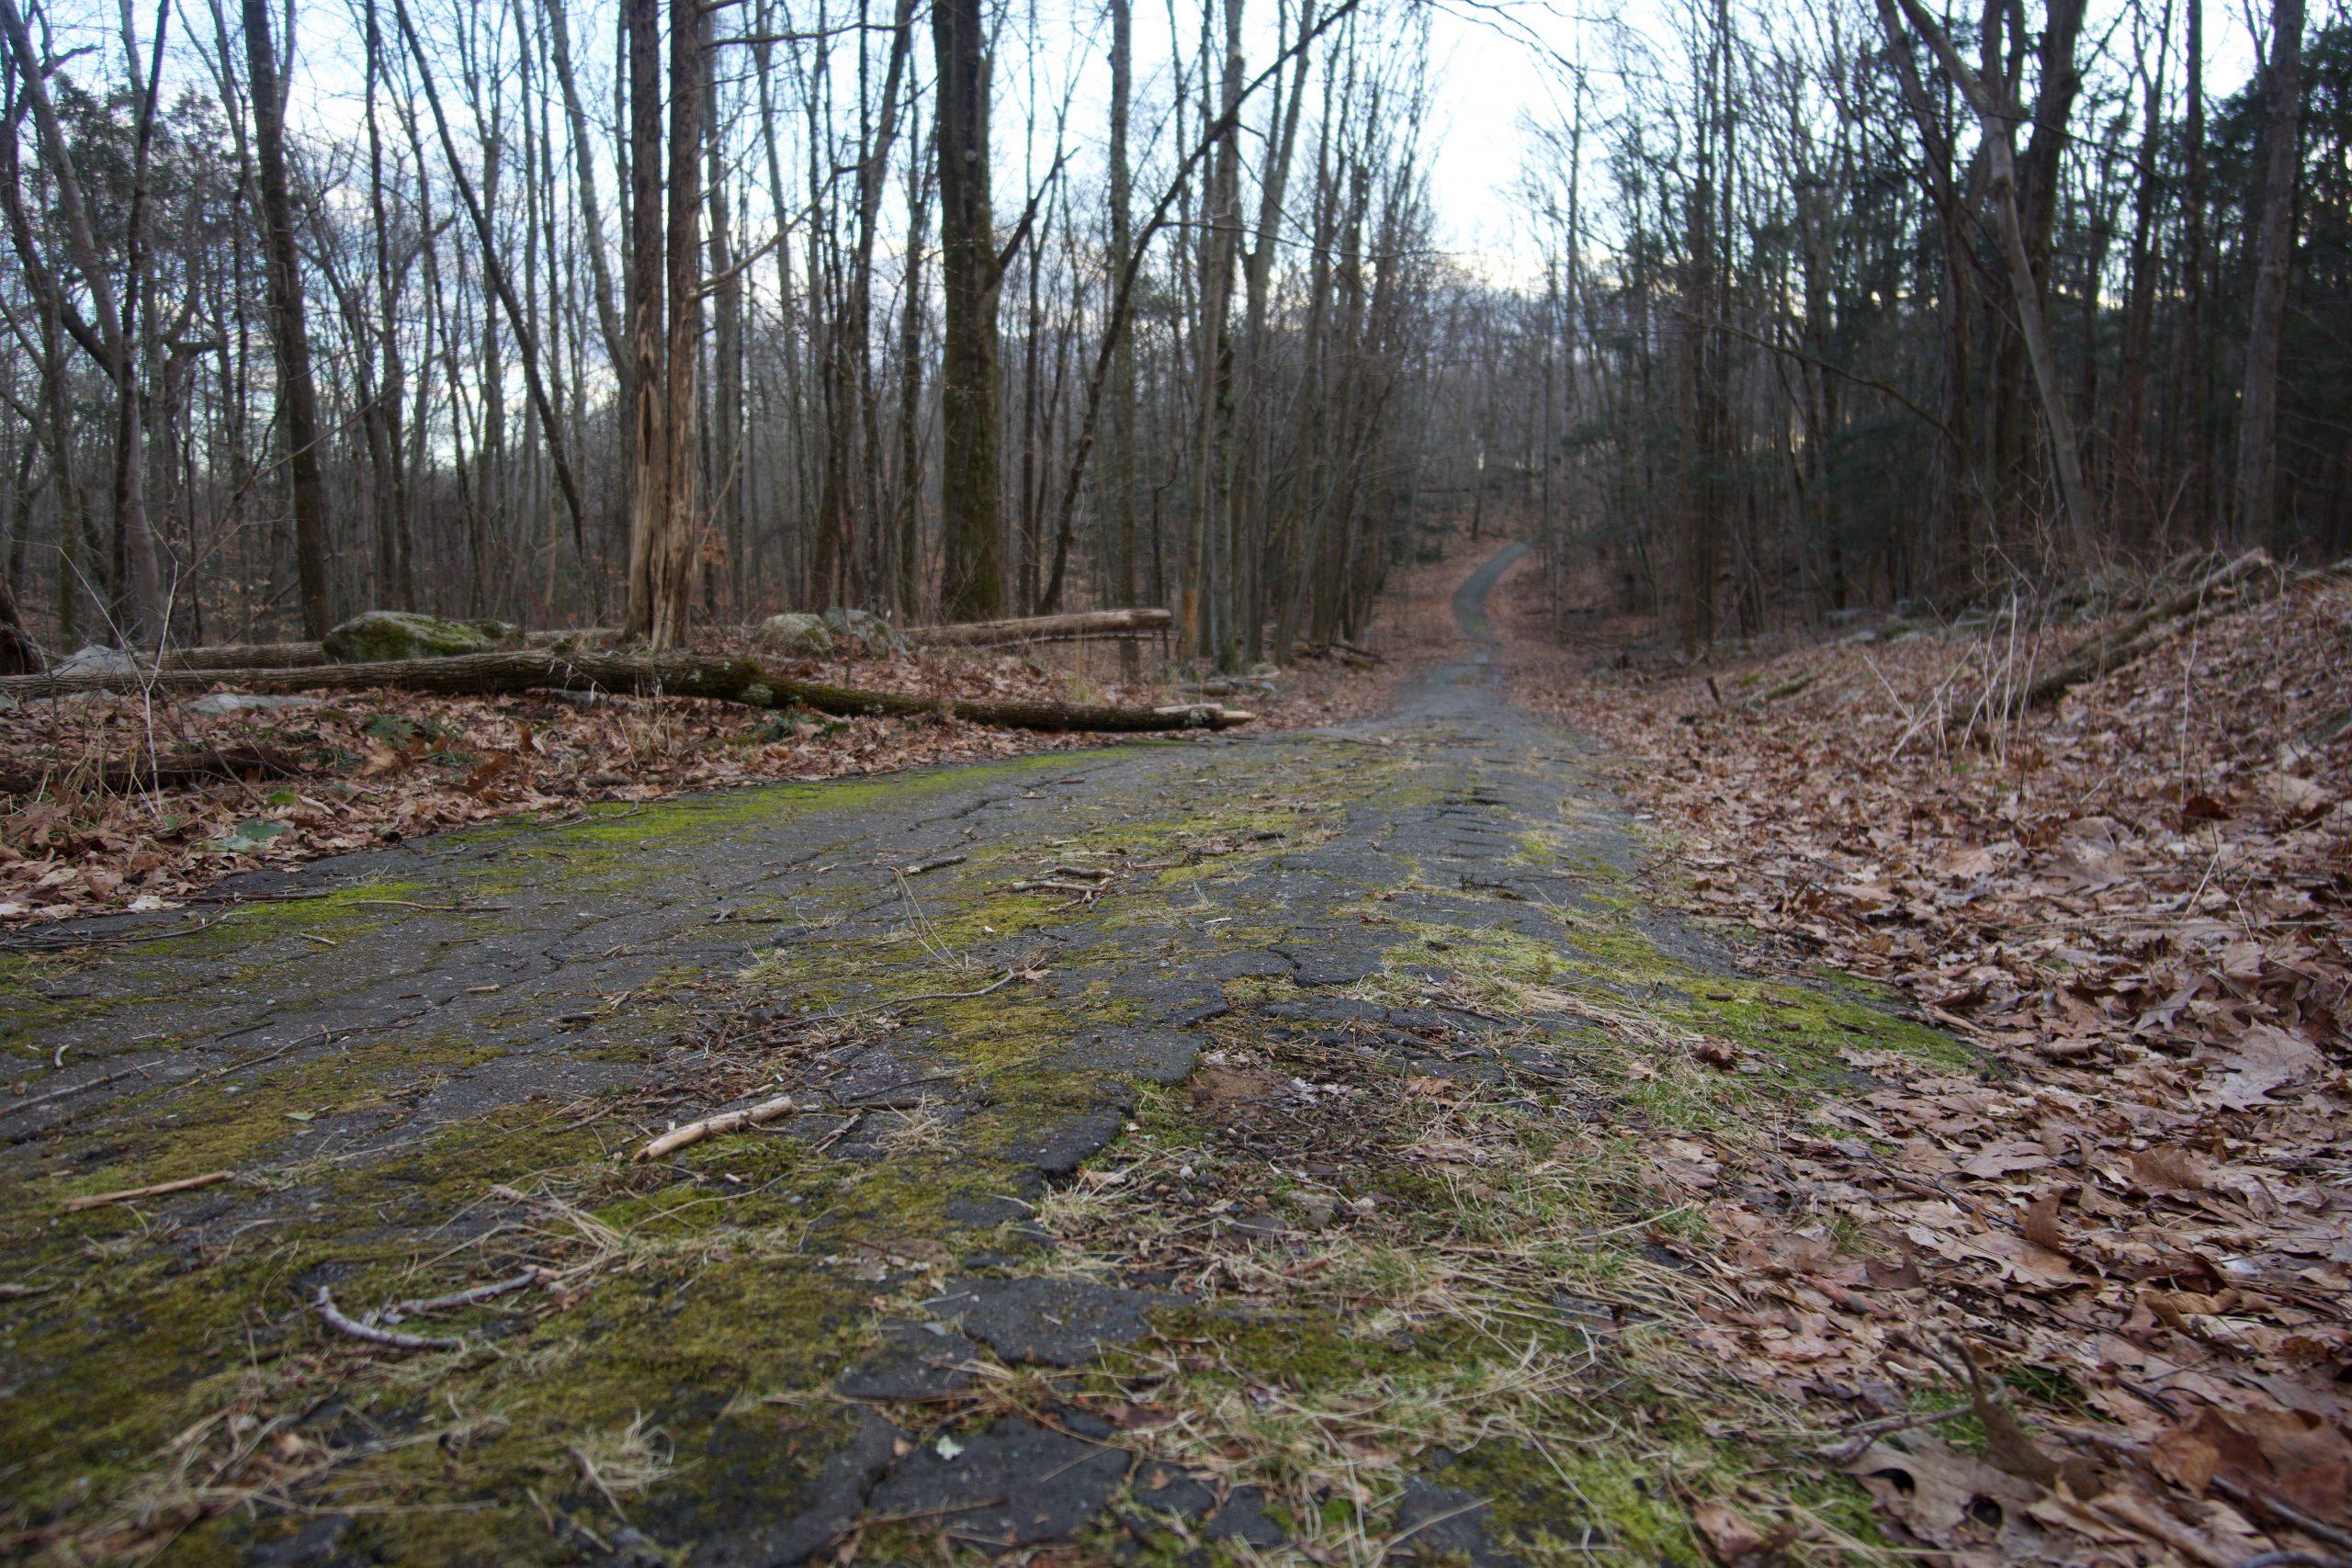 George Dudley Seymour Trail